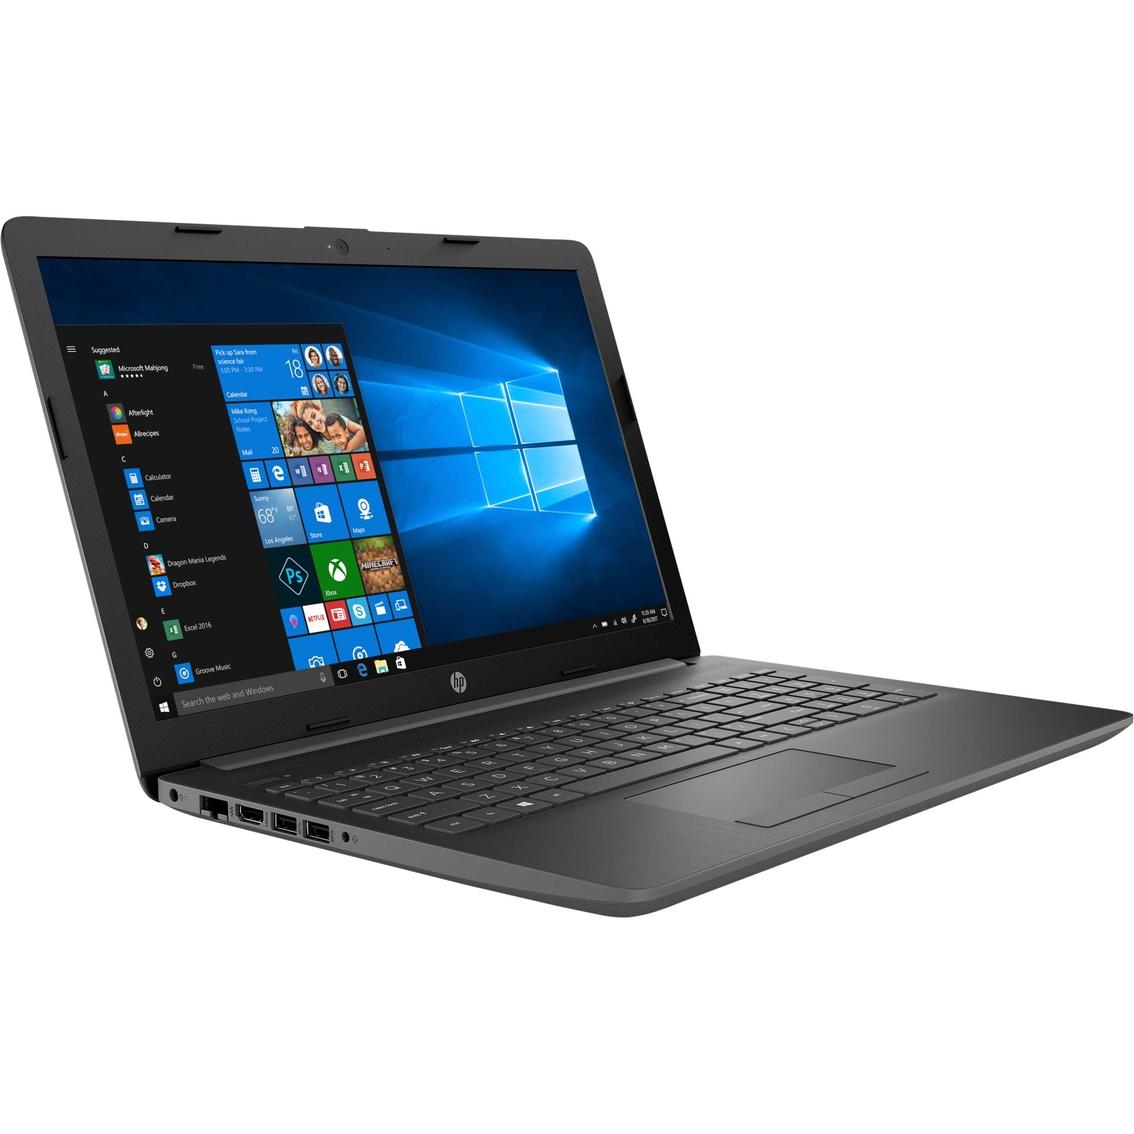 cc0b6abe5b48 Hp 15.6 In Intel Core I7 1.8ghz 8gb Ram 16 Gb Optane 1tb Notebook ...